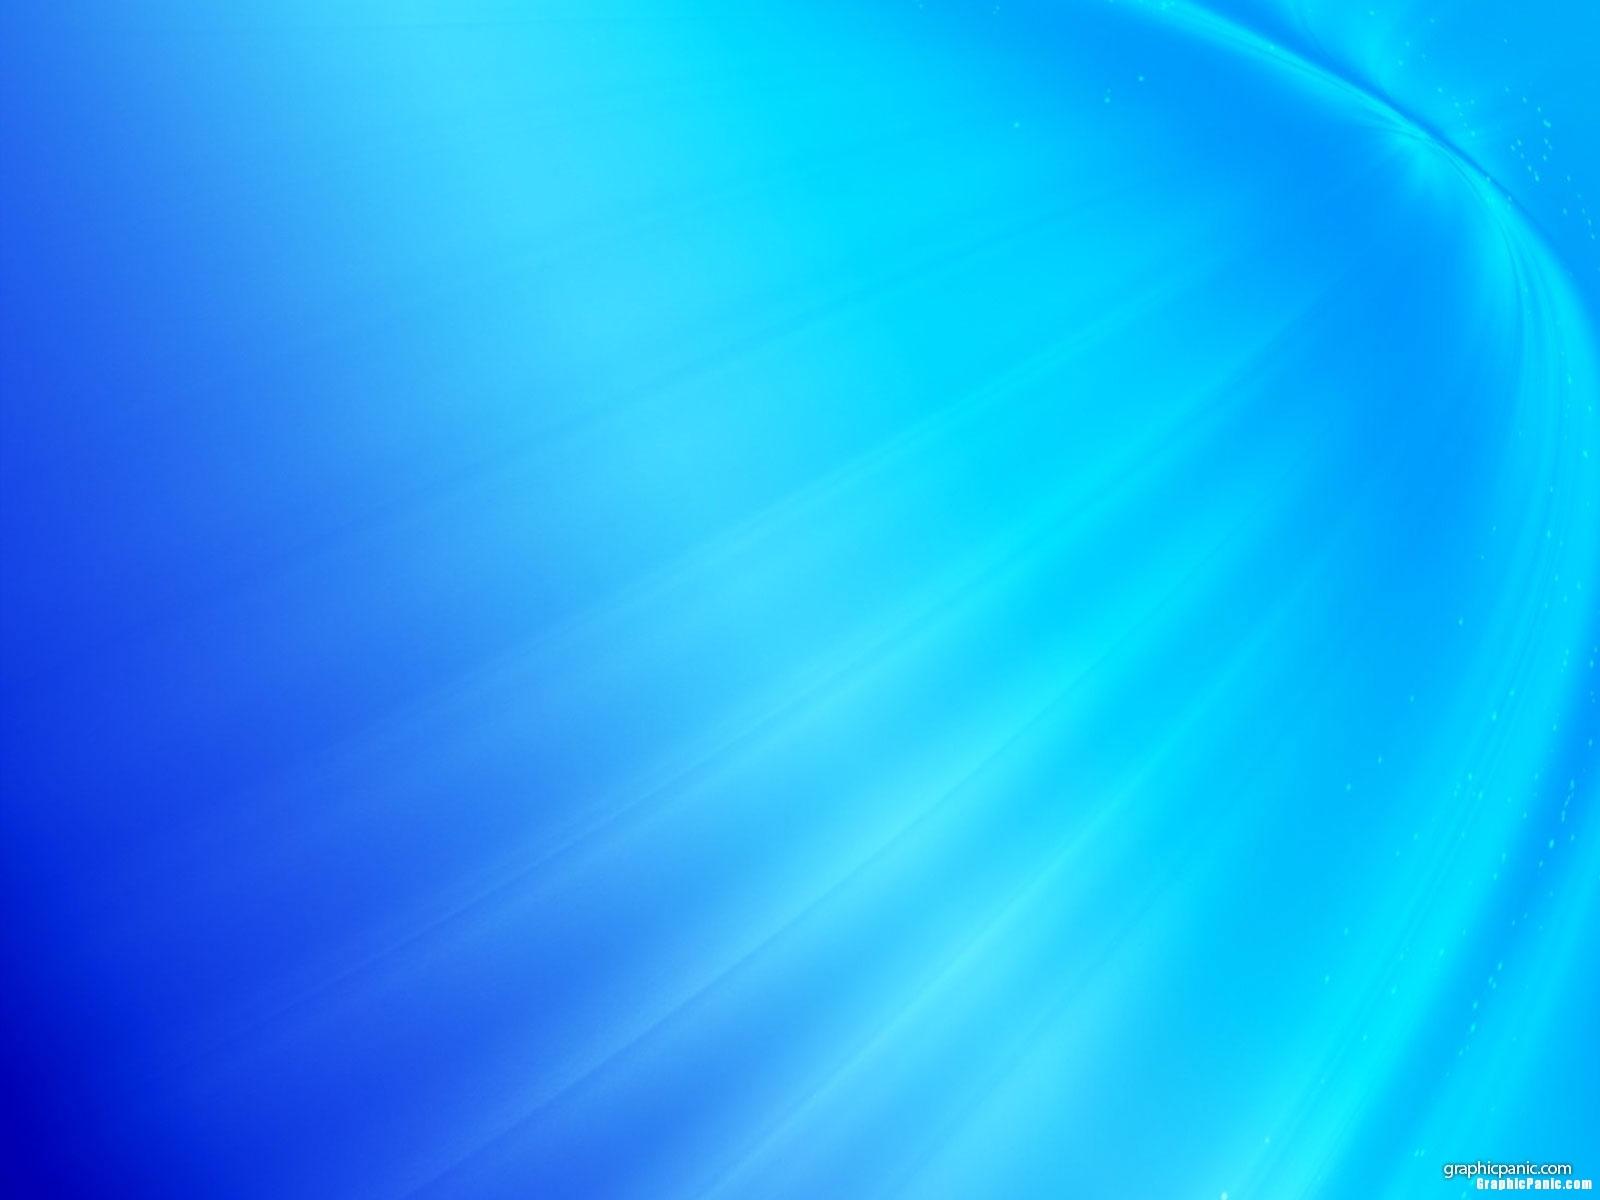 modern blue hd background